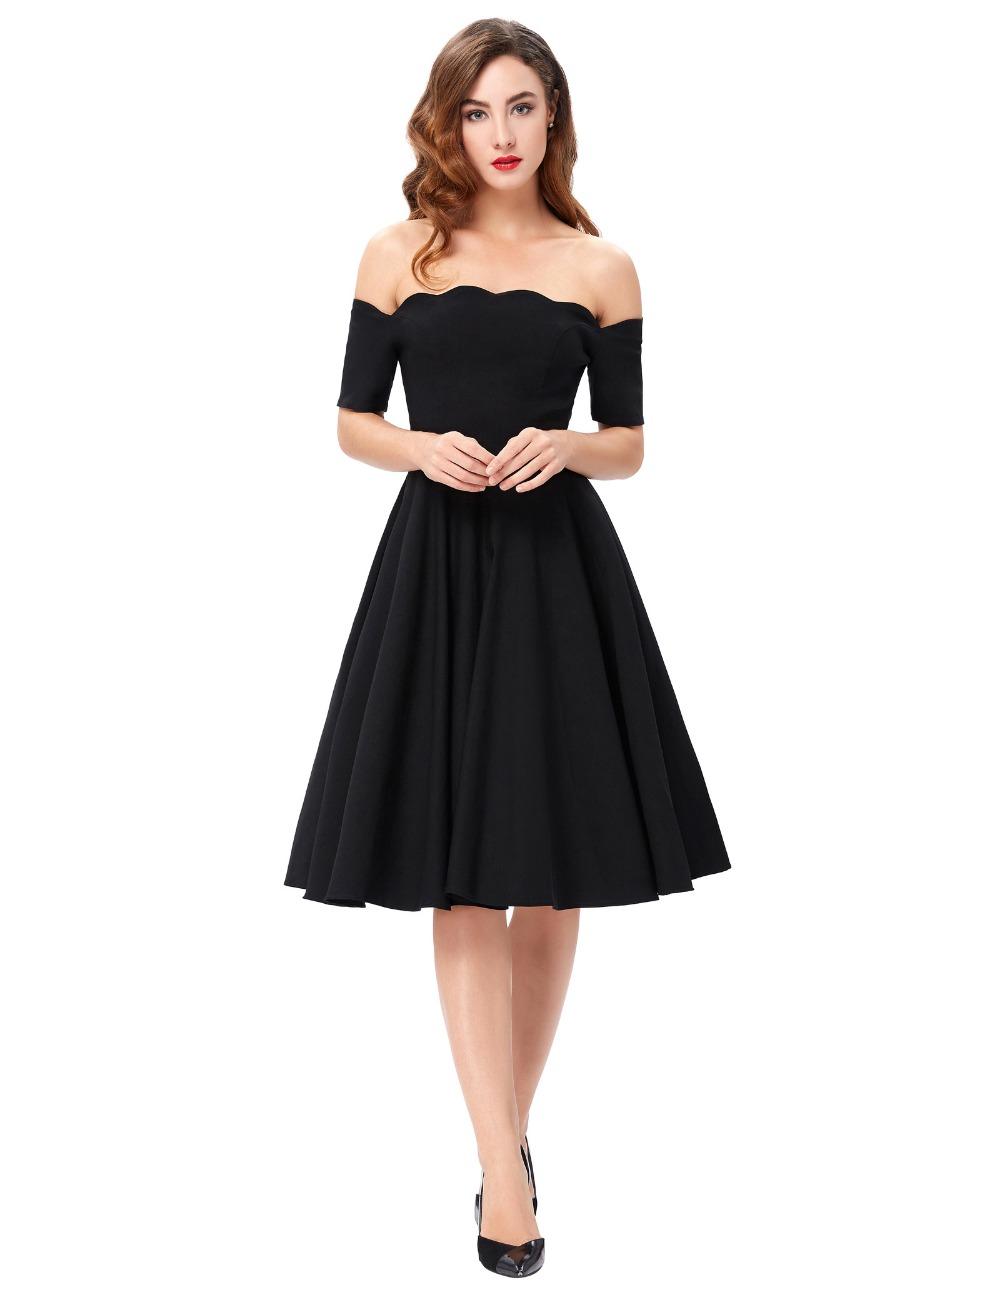 Belle Poque 17 Women Dress Robe Vintage Off Shoulder Black Summer Dress Jurken 1950s 60s Retro Rockabilly Swing Party Dresses 7